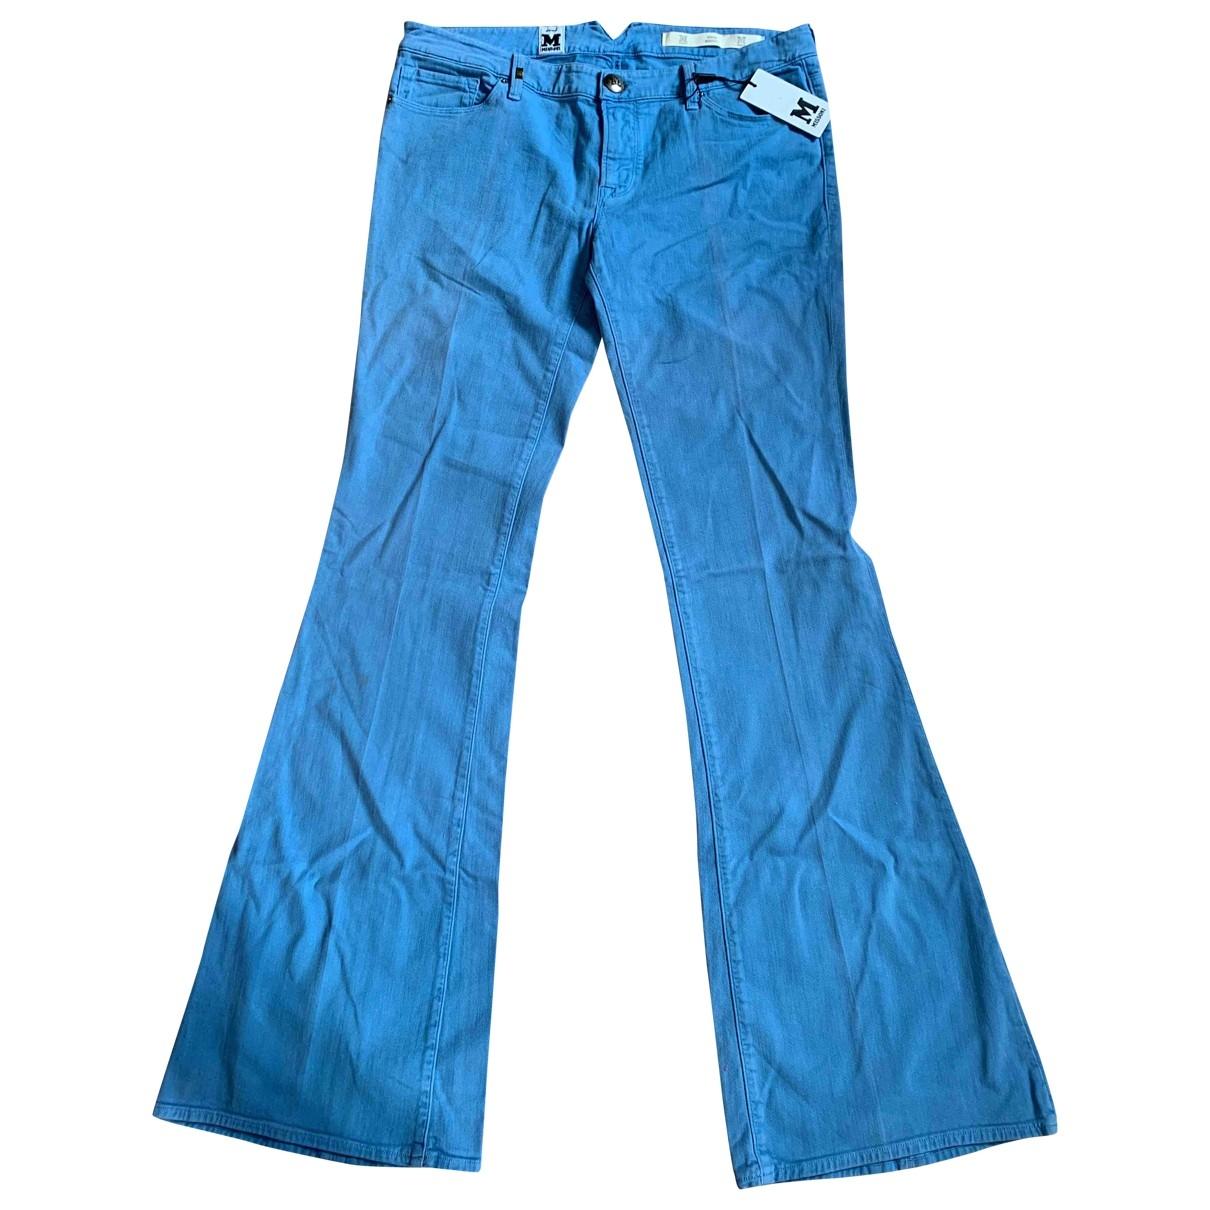 M Missoni \N Blue Cotton - elasthane Jeans for Women 33 US